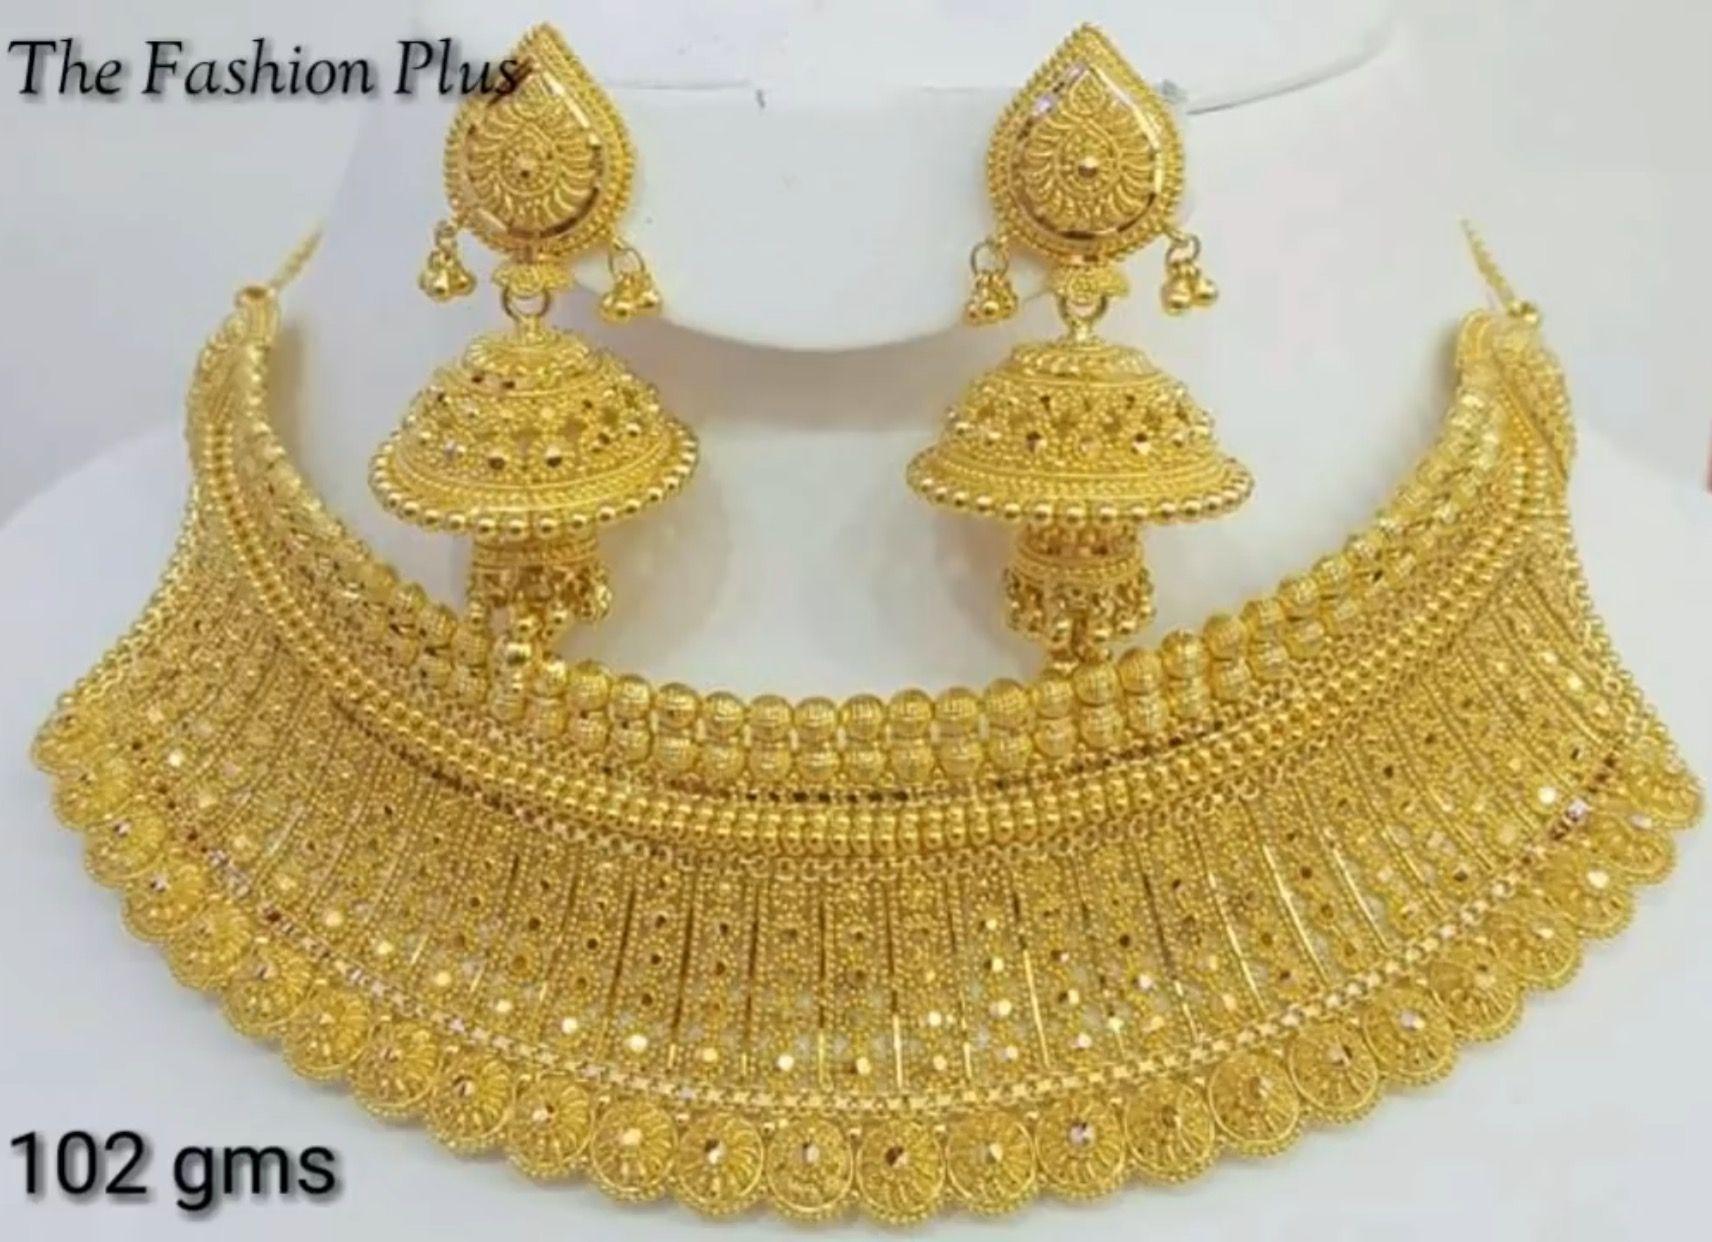 Jwalary Bridal Gold Jewellery Designs Gold Jewelry Fashion Bridal Gold Jewellery